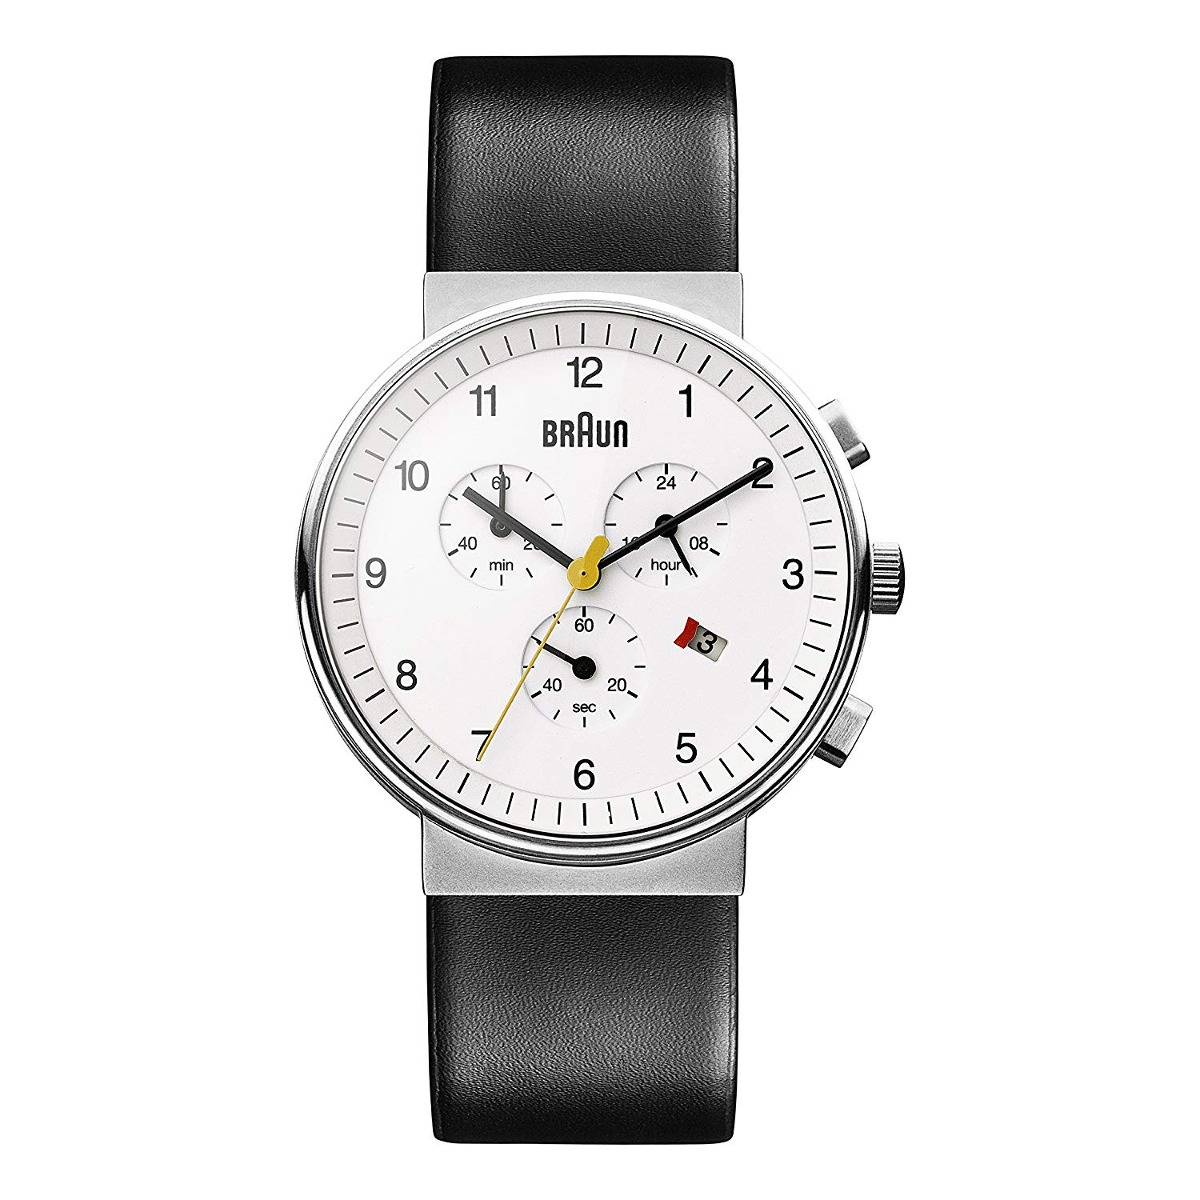 a2c11be9bc1 relógio braun gents bn0032 classic watch w - 79045. Carregando zoom.